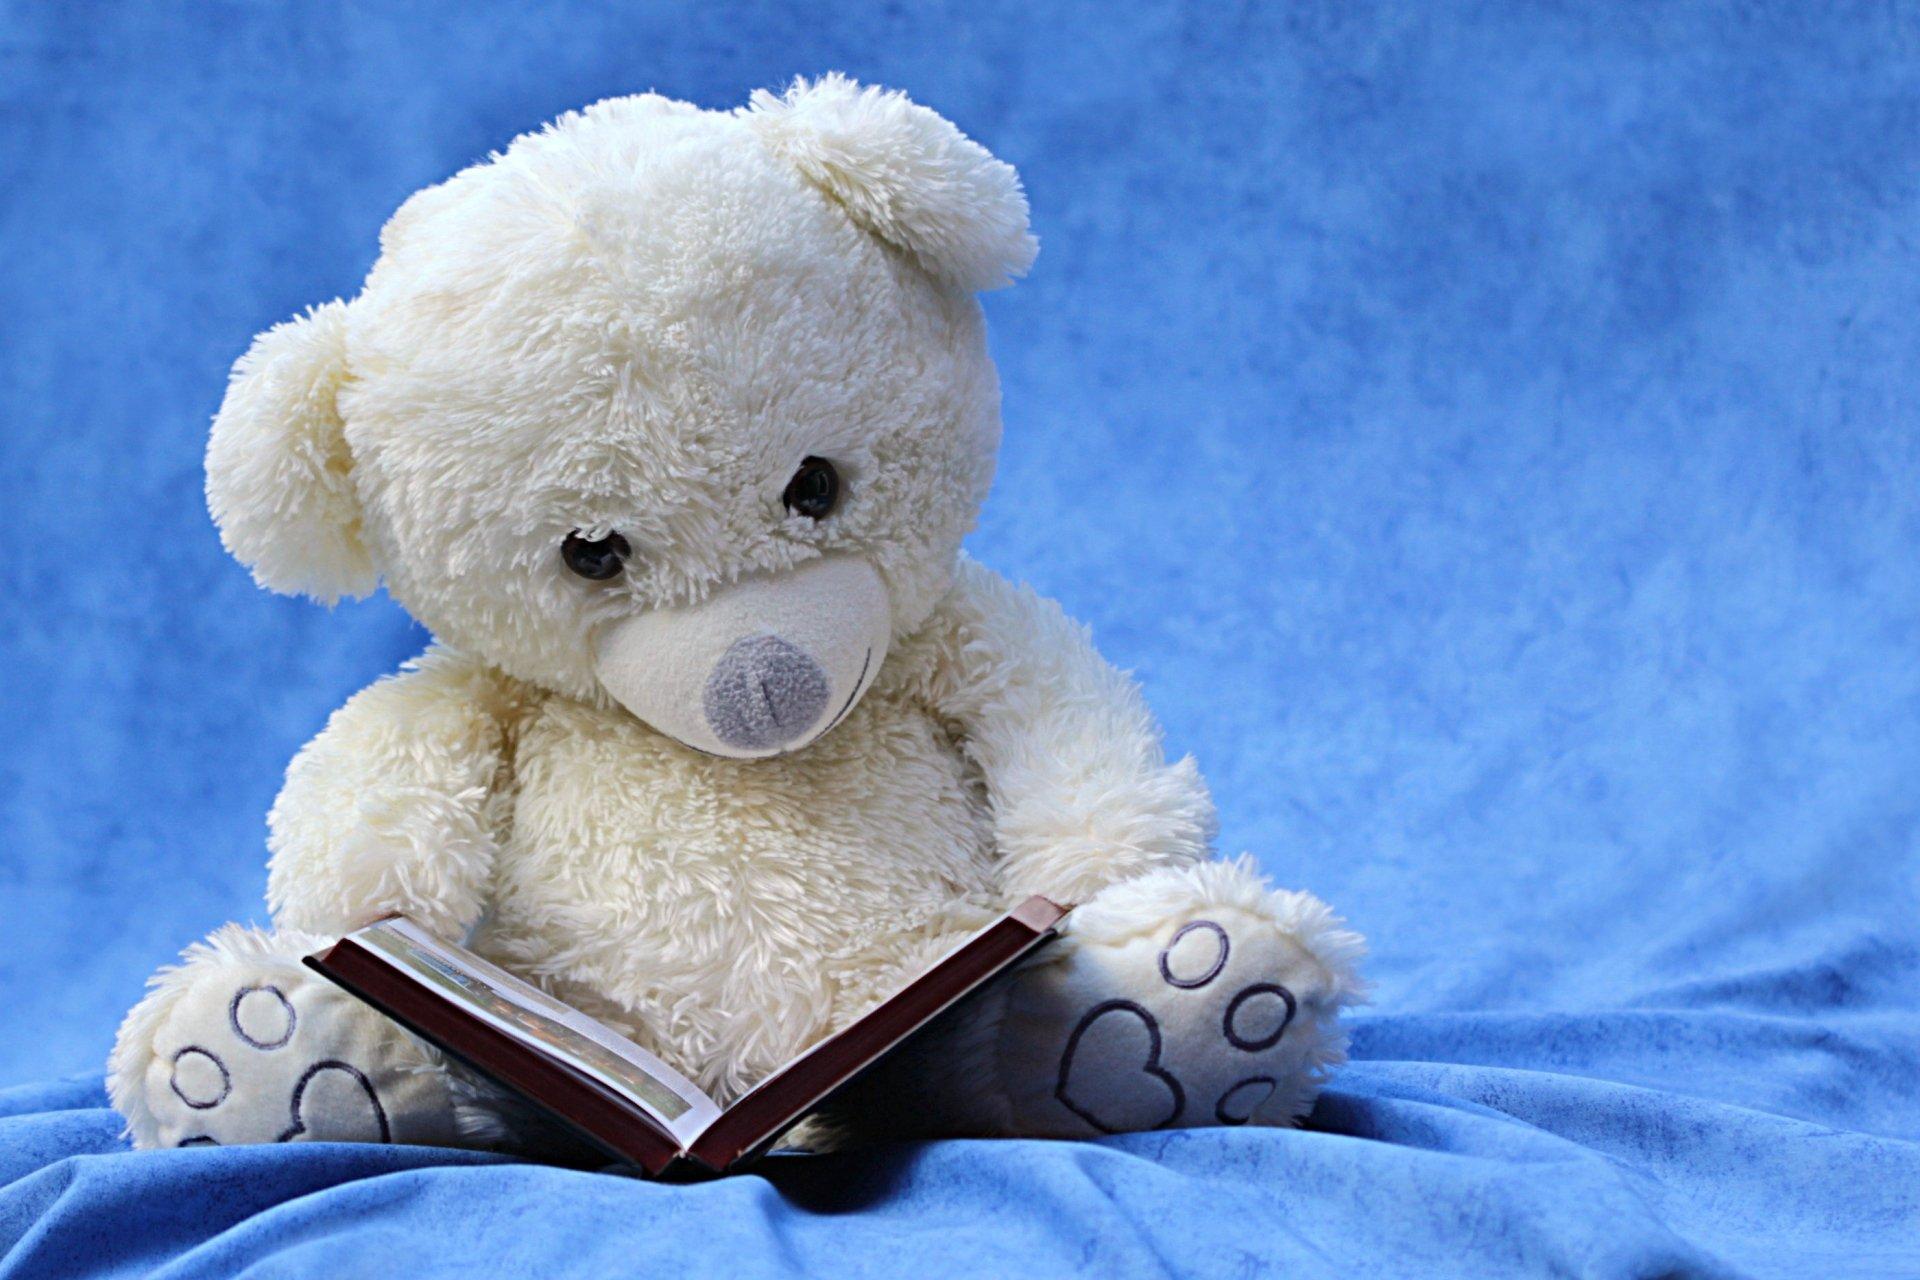 Man Made - Stuffed Animal  Teddy Bear Toy Book Still Life Blue Wallpaper